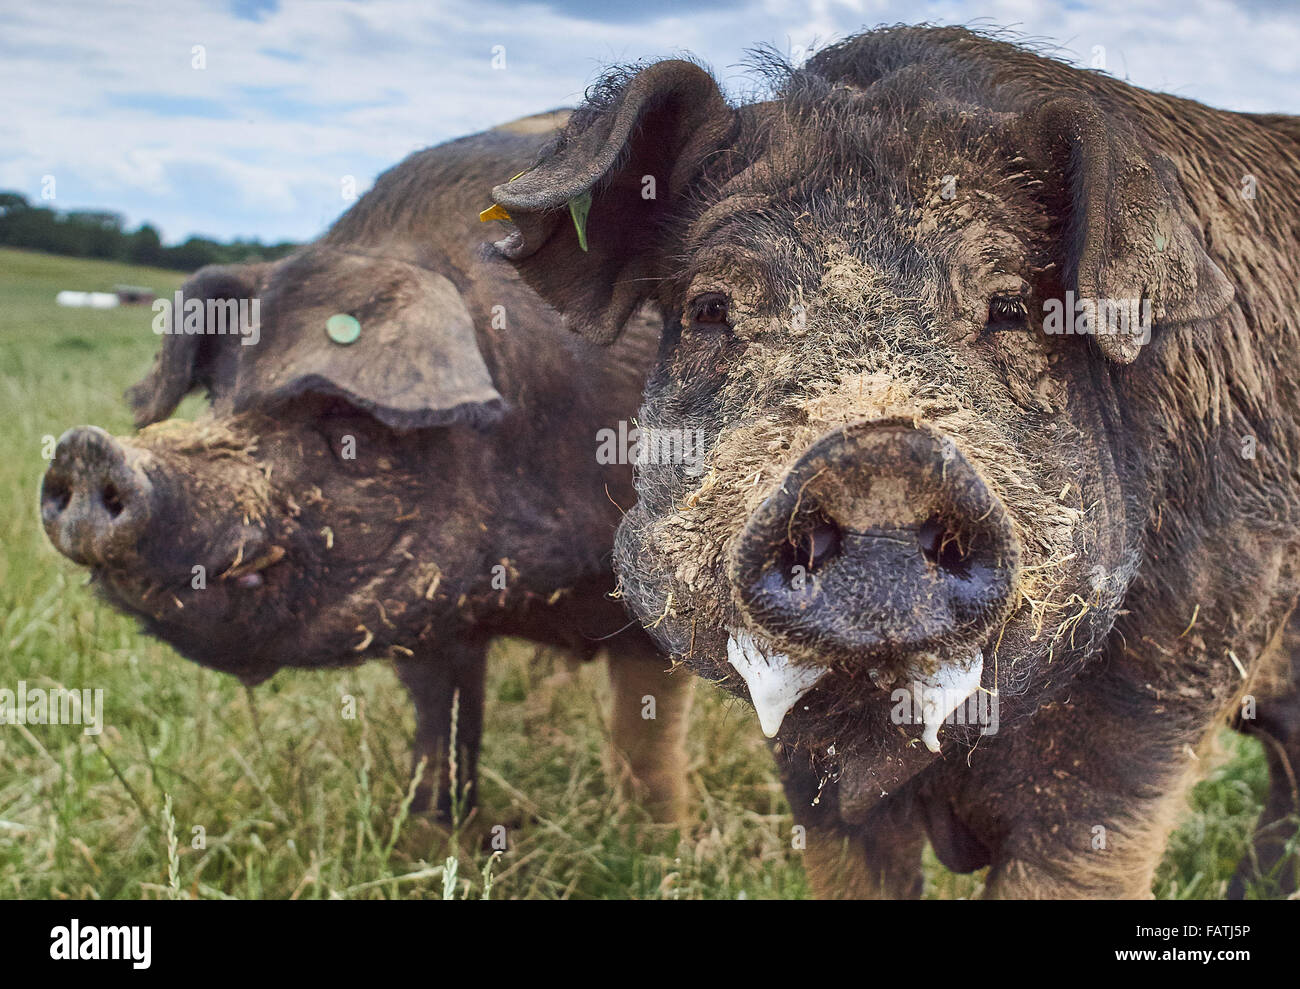 Cabeza disparado cerca del intervalo libre de cerdos en un campo de hierba Imagen De Stock